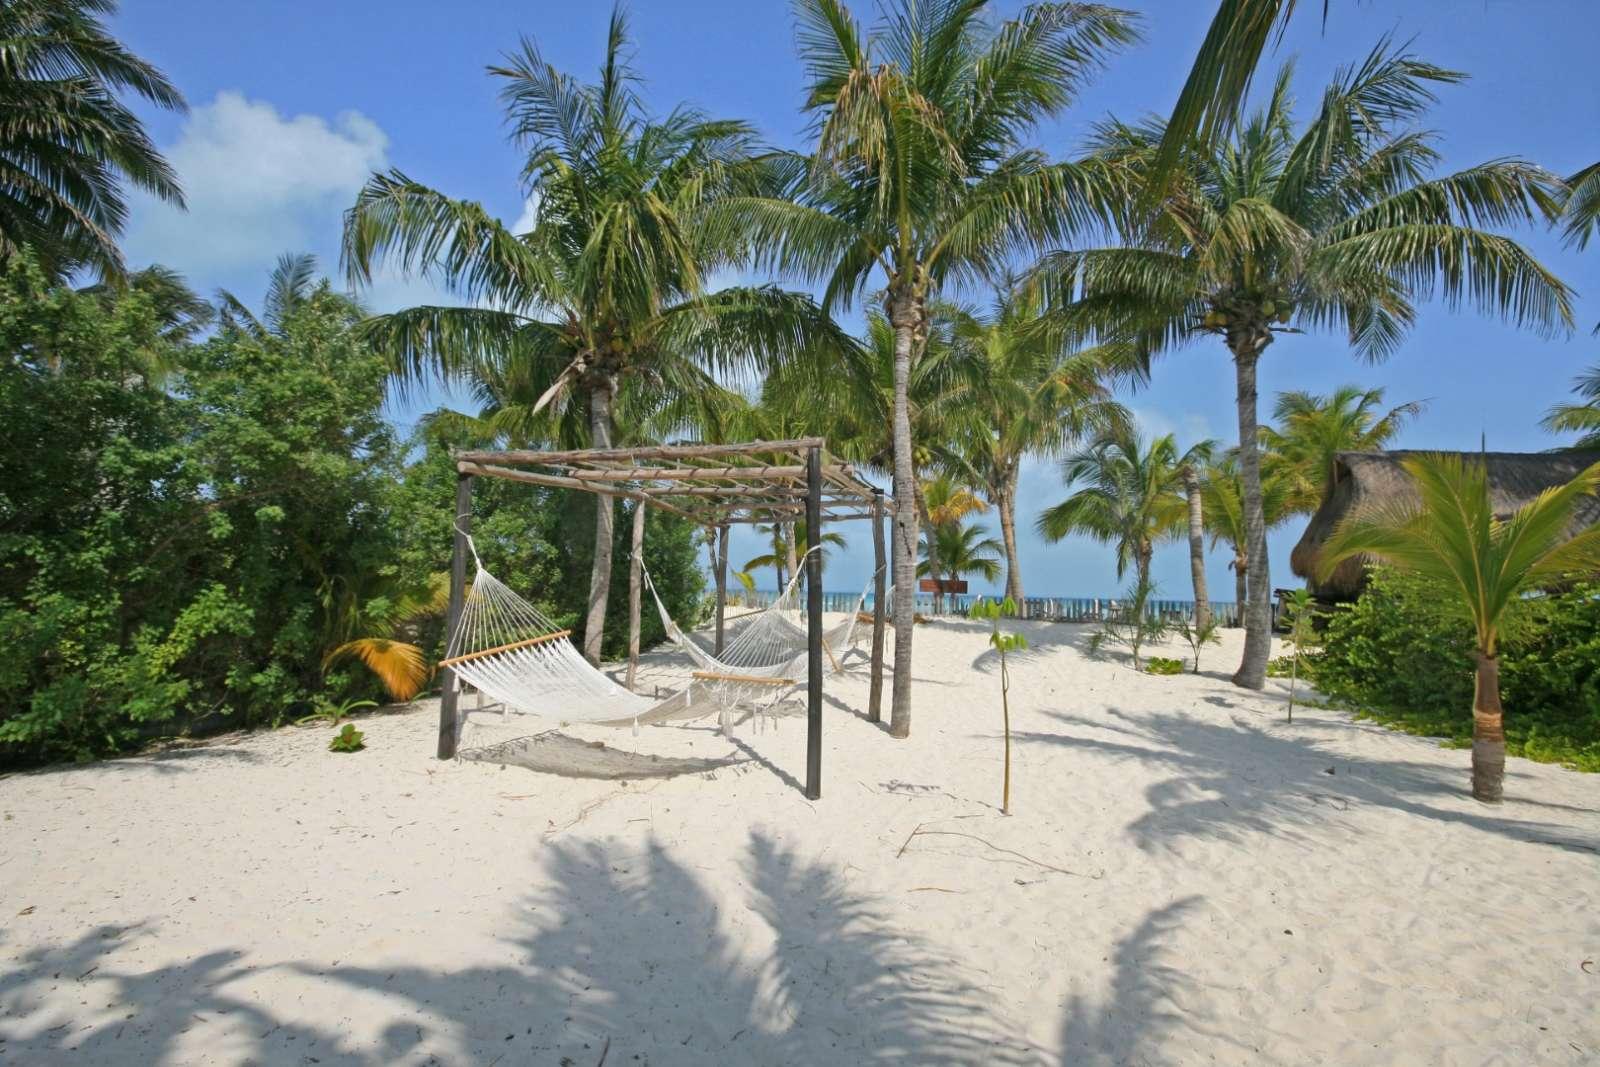 Beach hammocks at Cabanas Maria Del Mar, Isla Mujeres